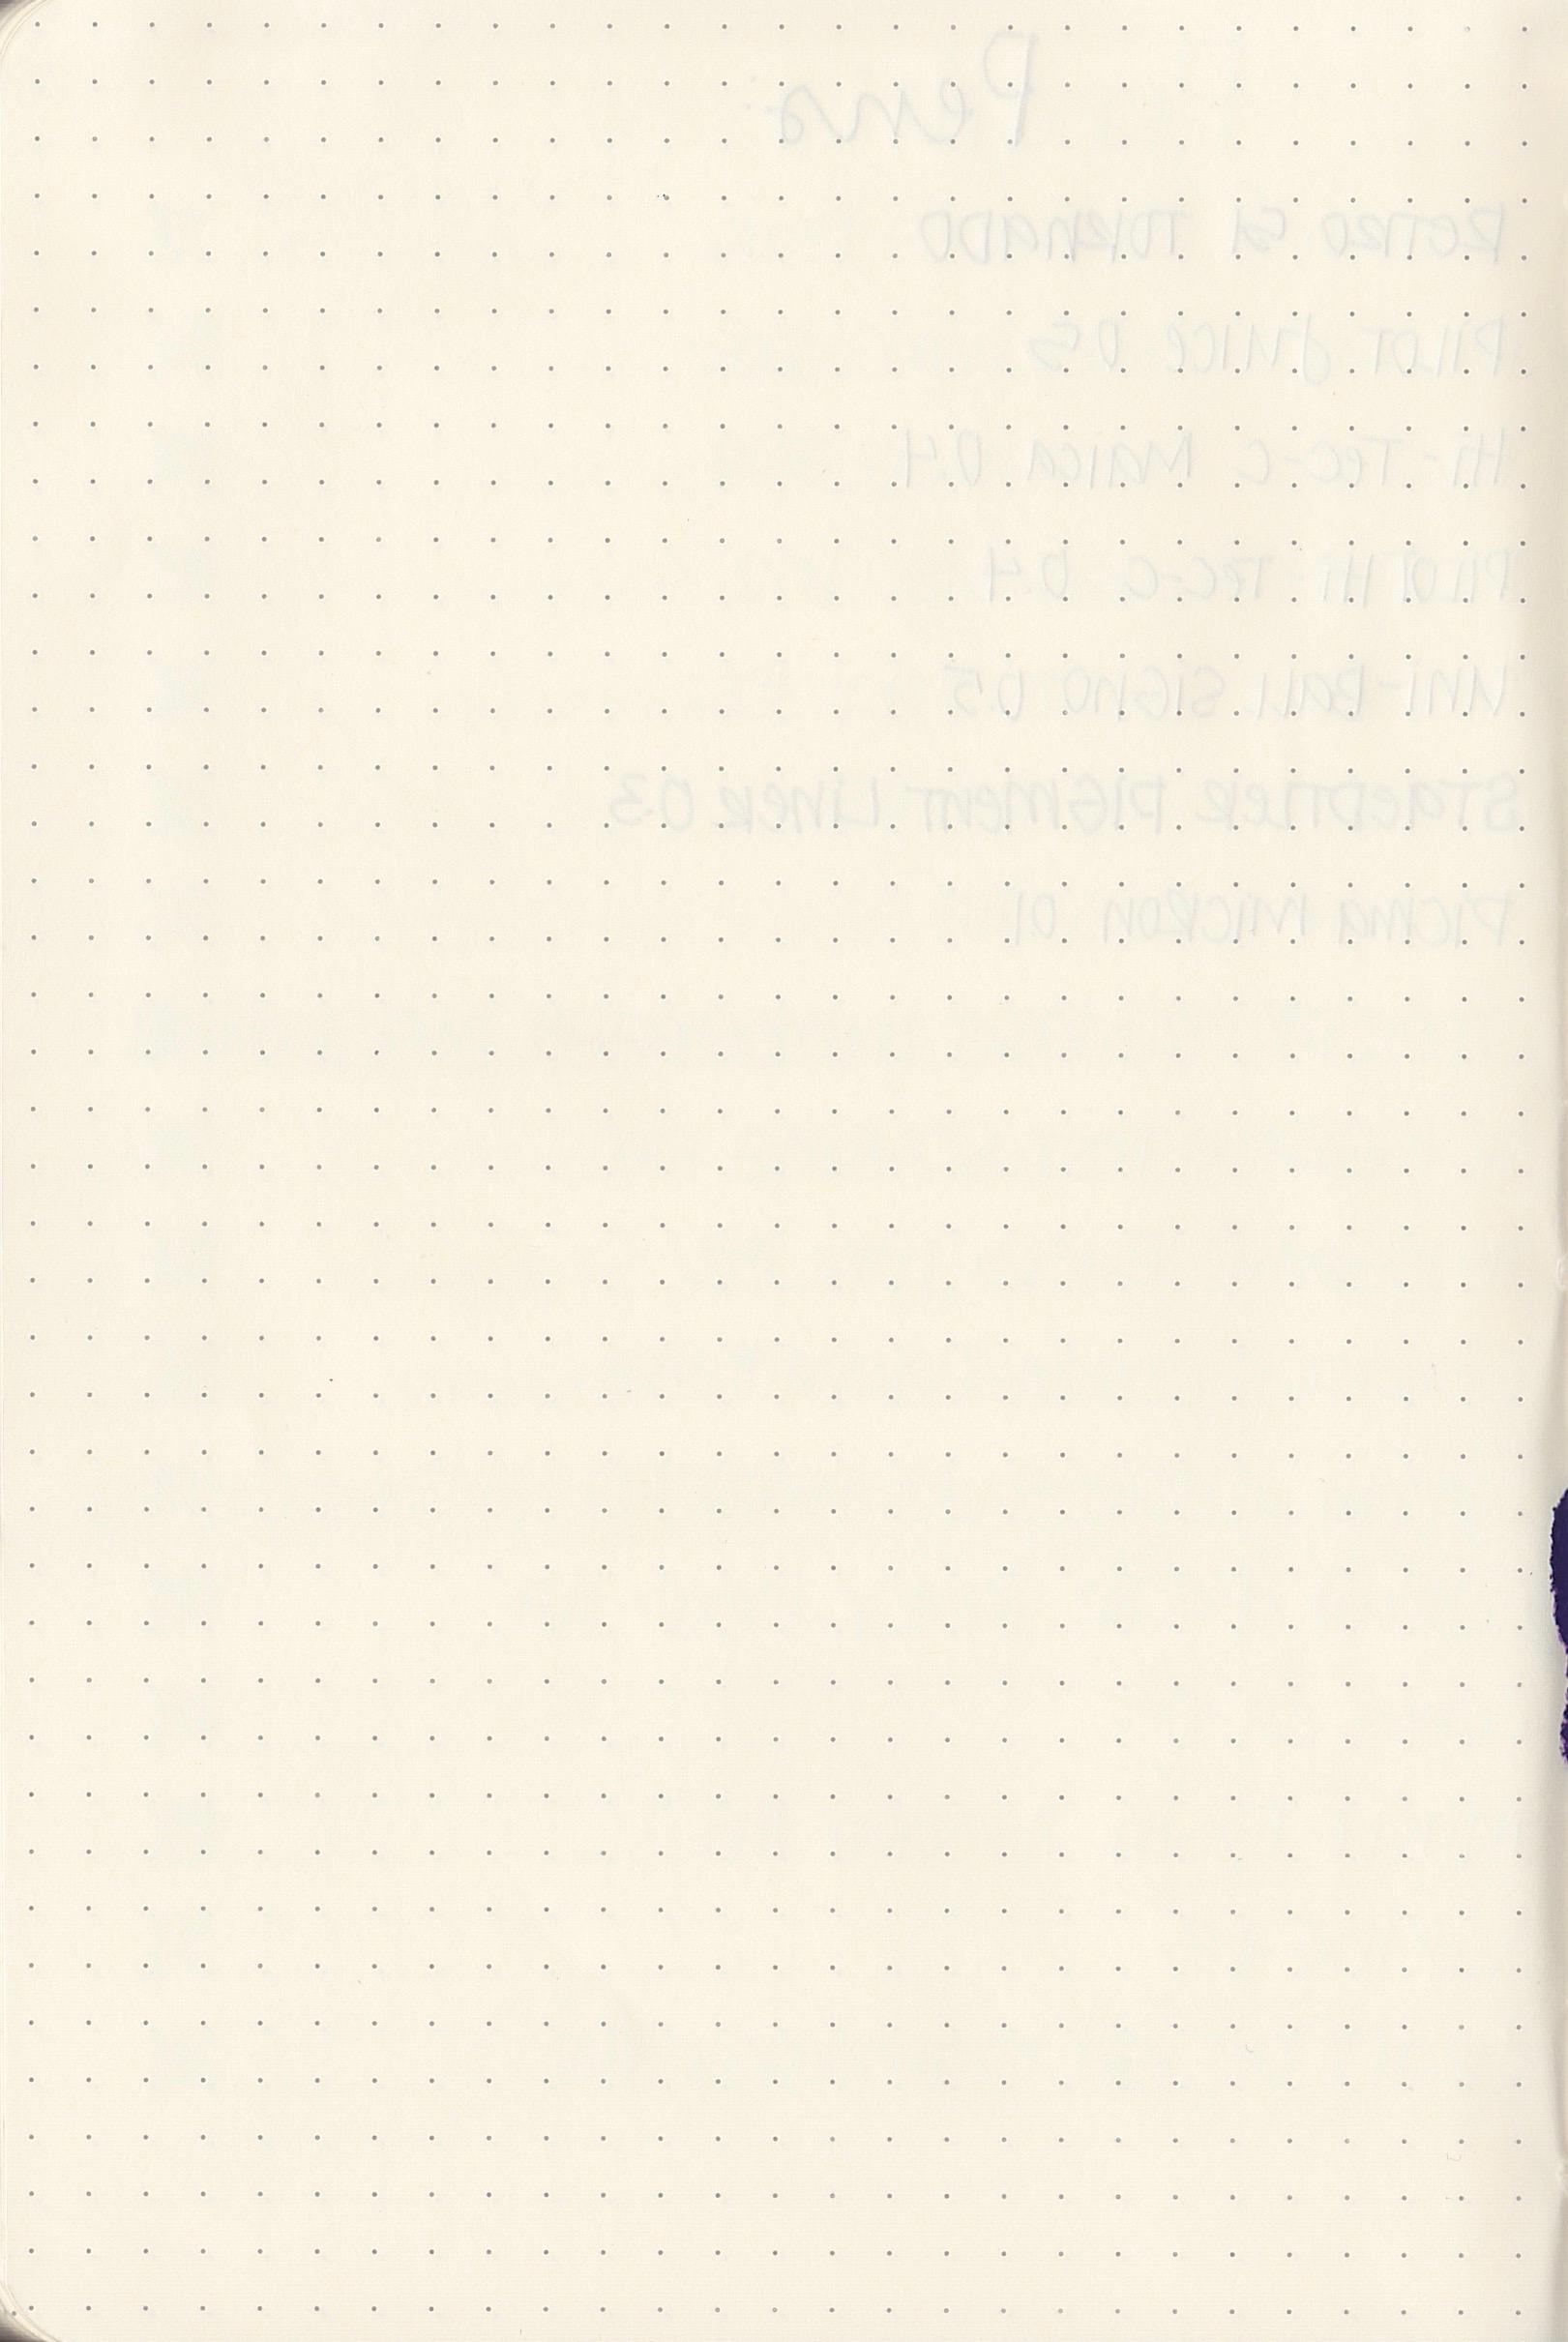 RhodiaWebnotebook2 - 7.jpg